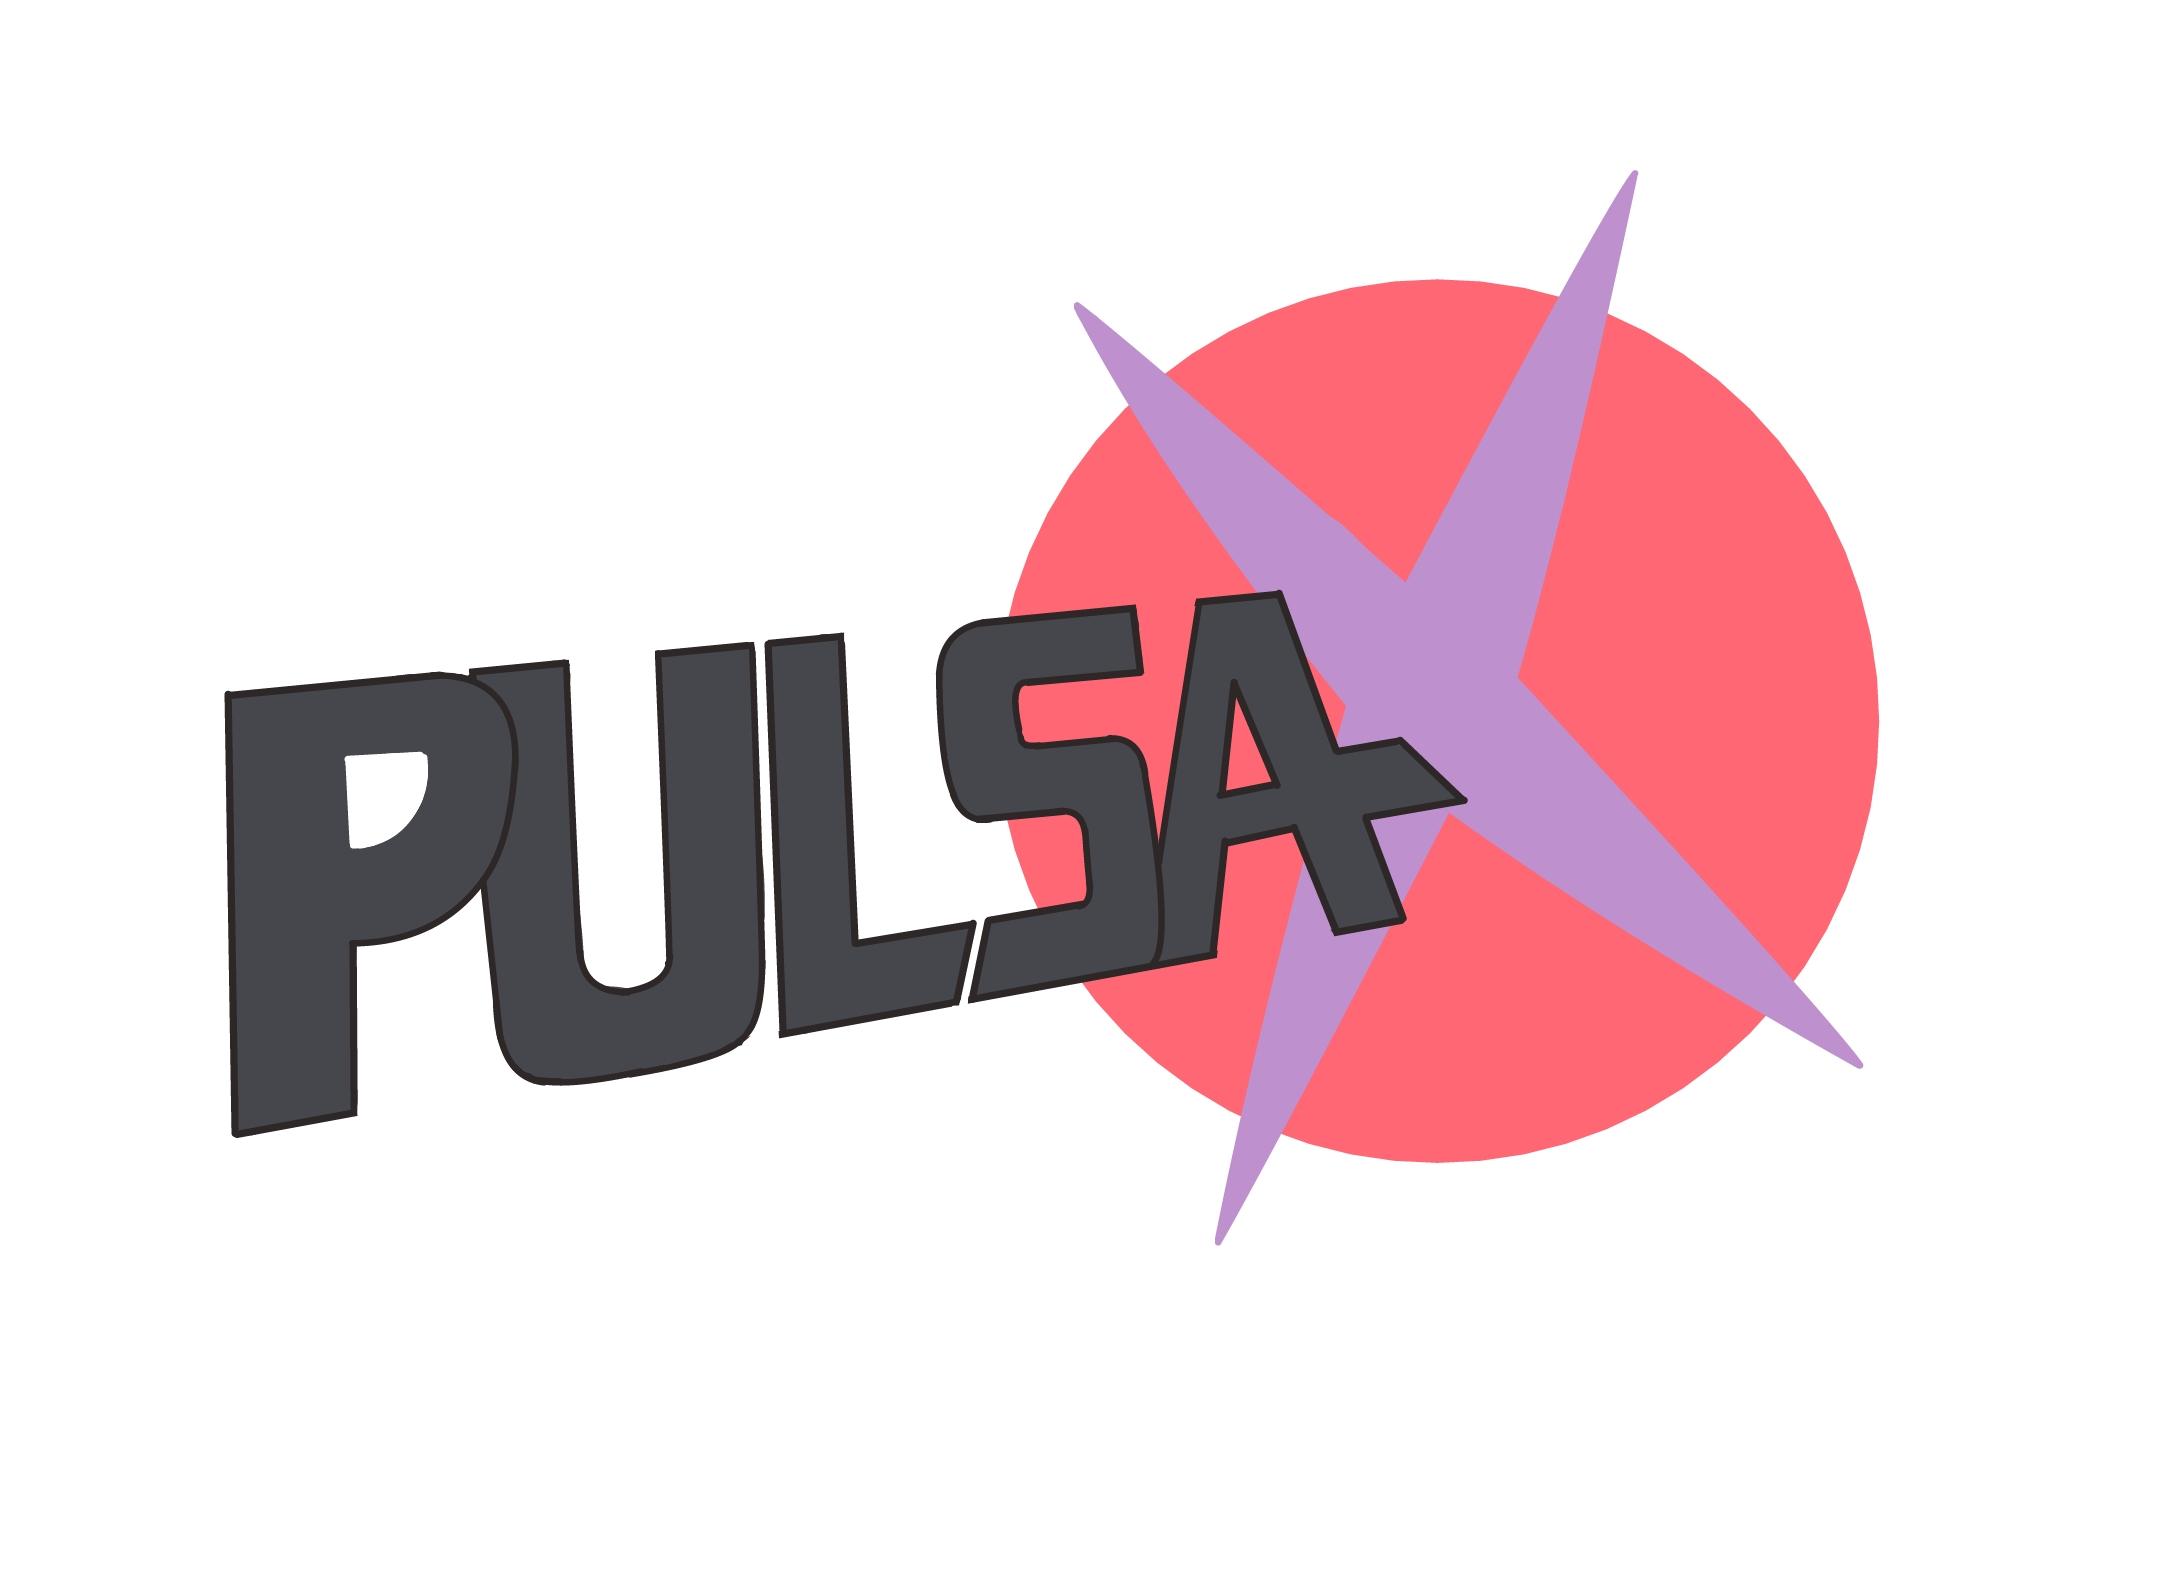 PULSAX-PROGRAMA7